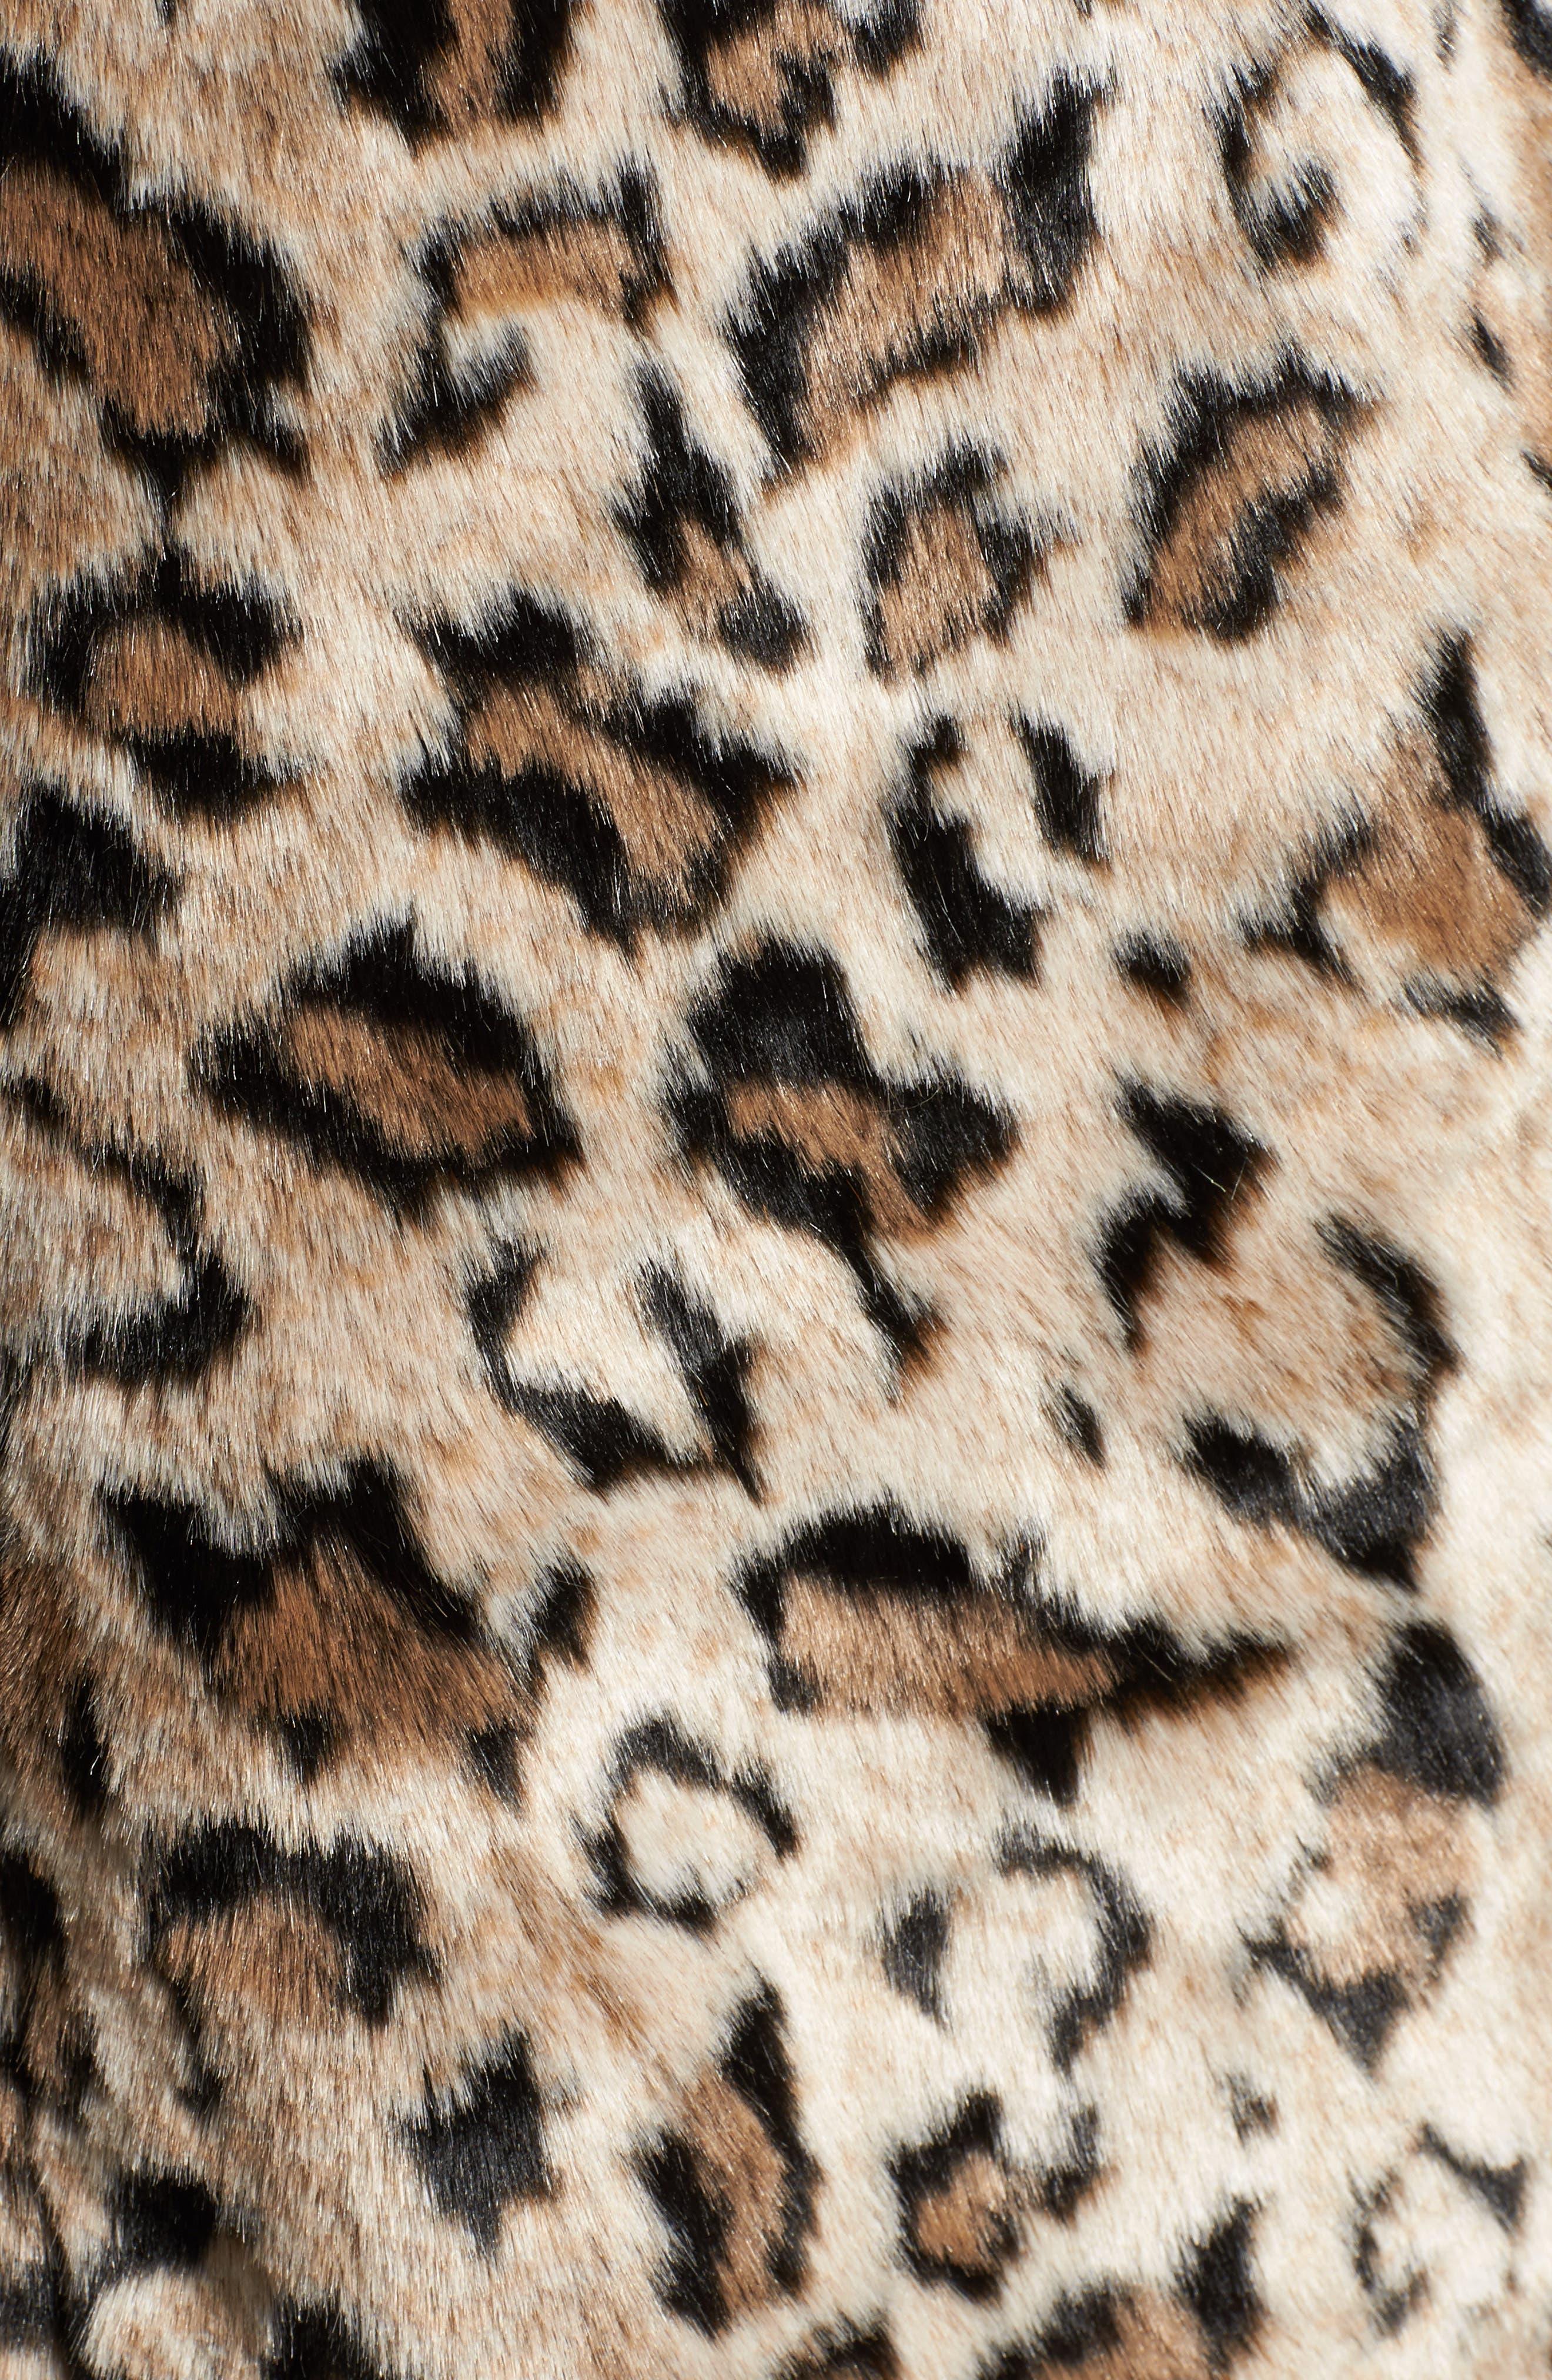 Abeni Faux Fur Coat,                             Alternate thumbnail 6, color,                             230